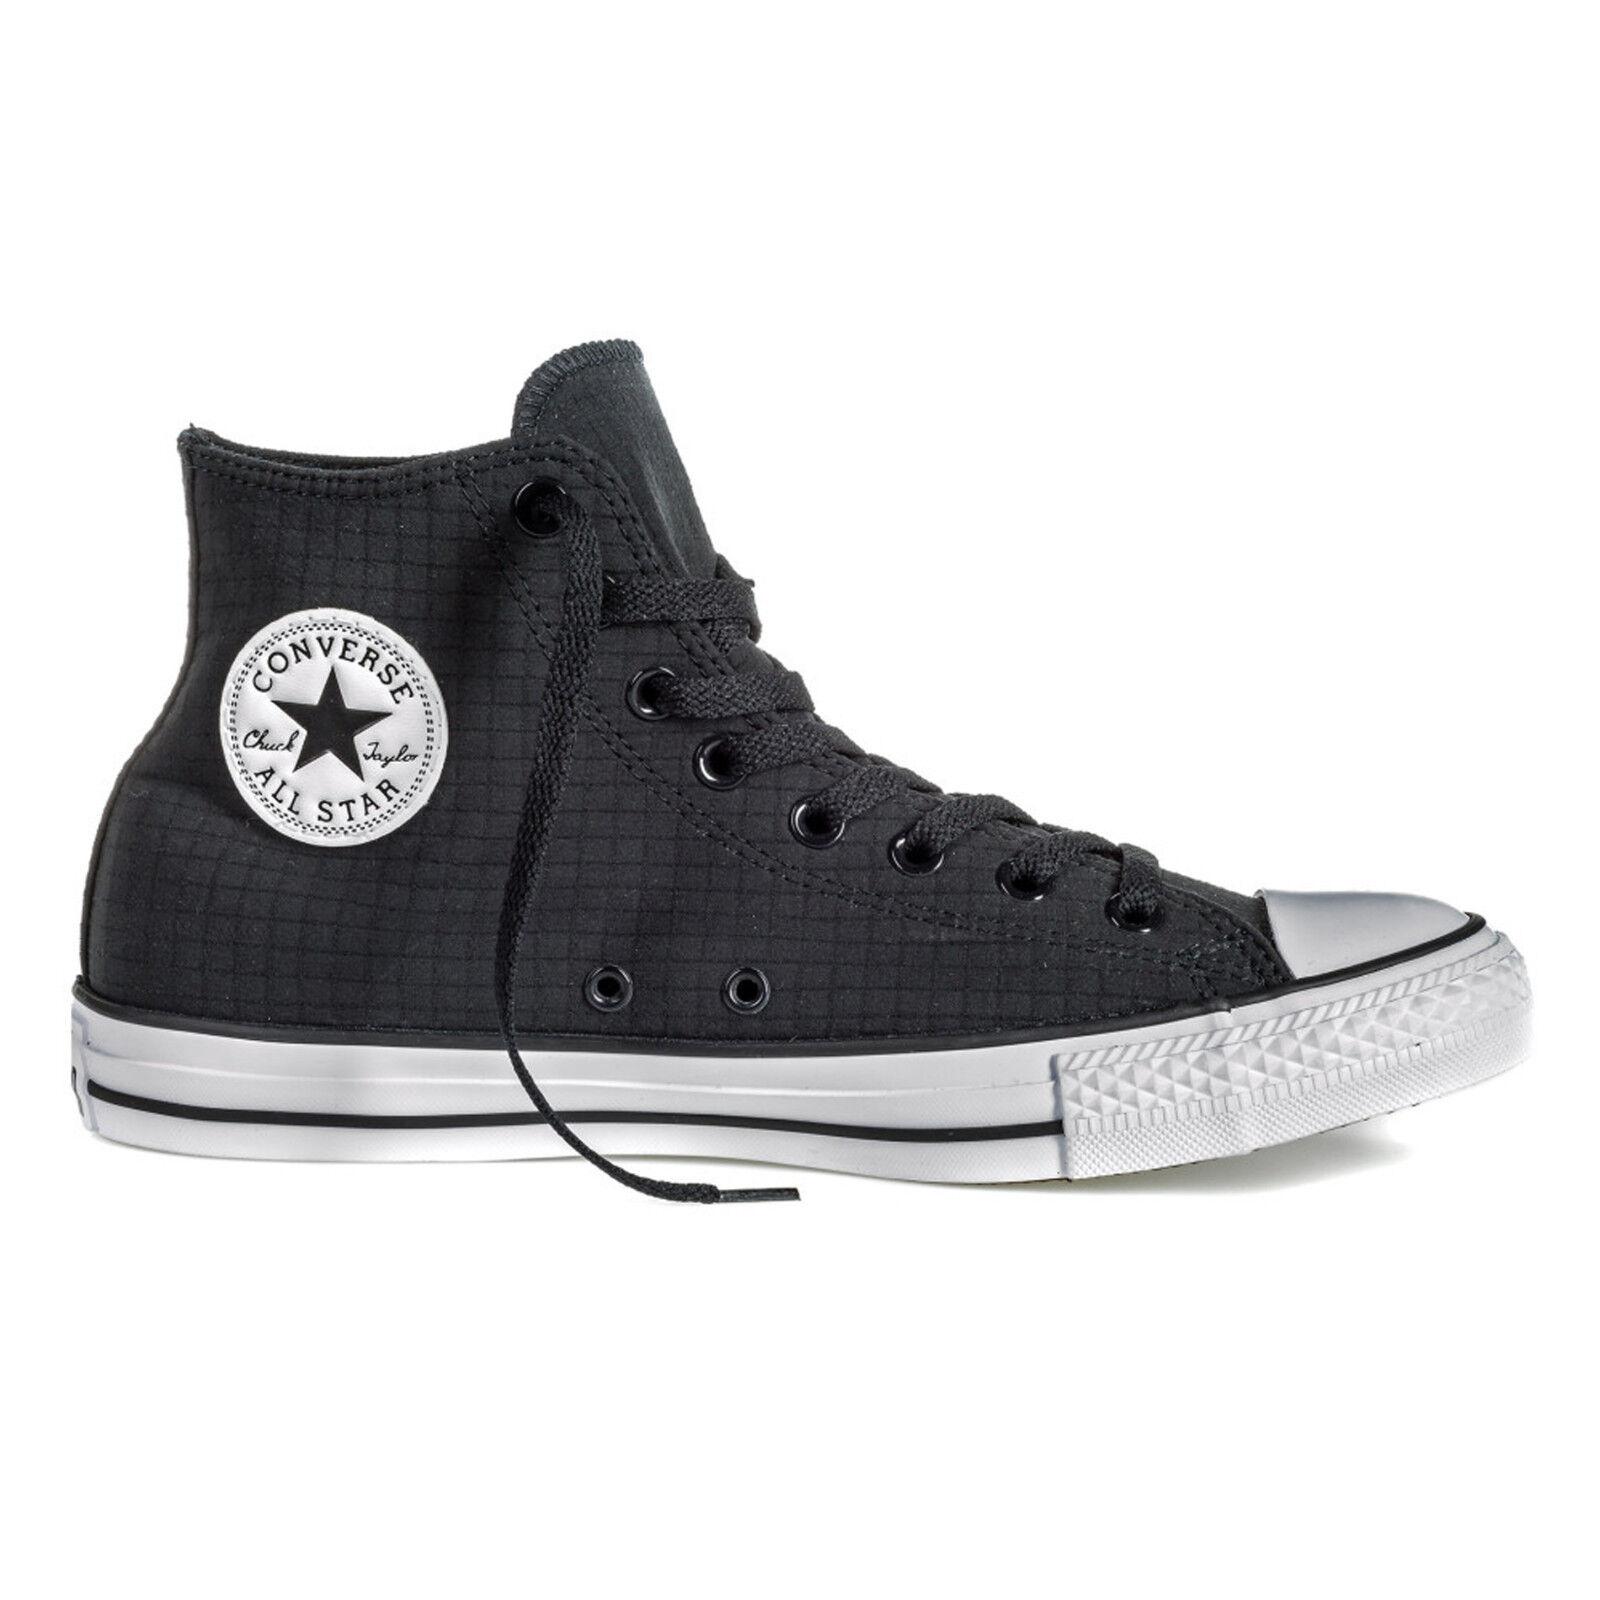 Converse - CTBS HI Black/White/Black Chuck Taylor Bll Star HI Schuhe Chucks Schu